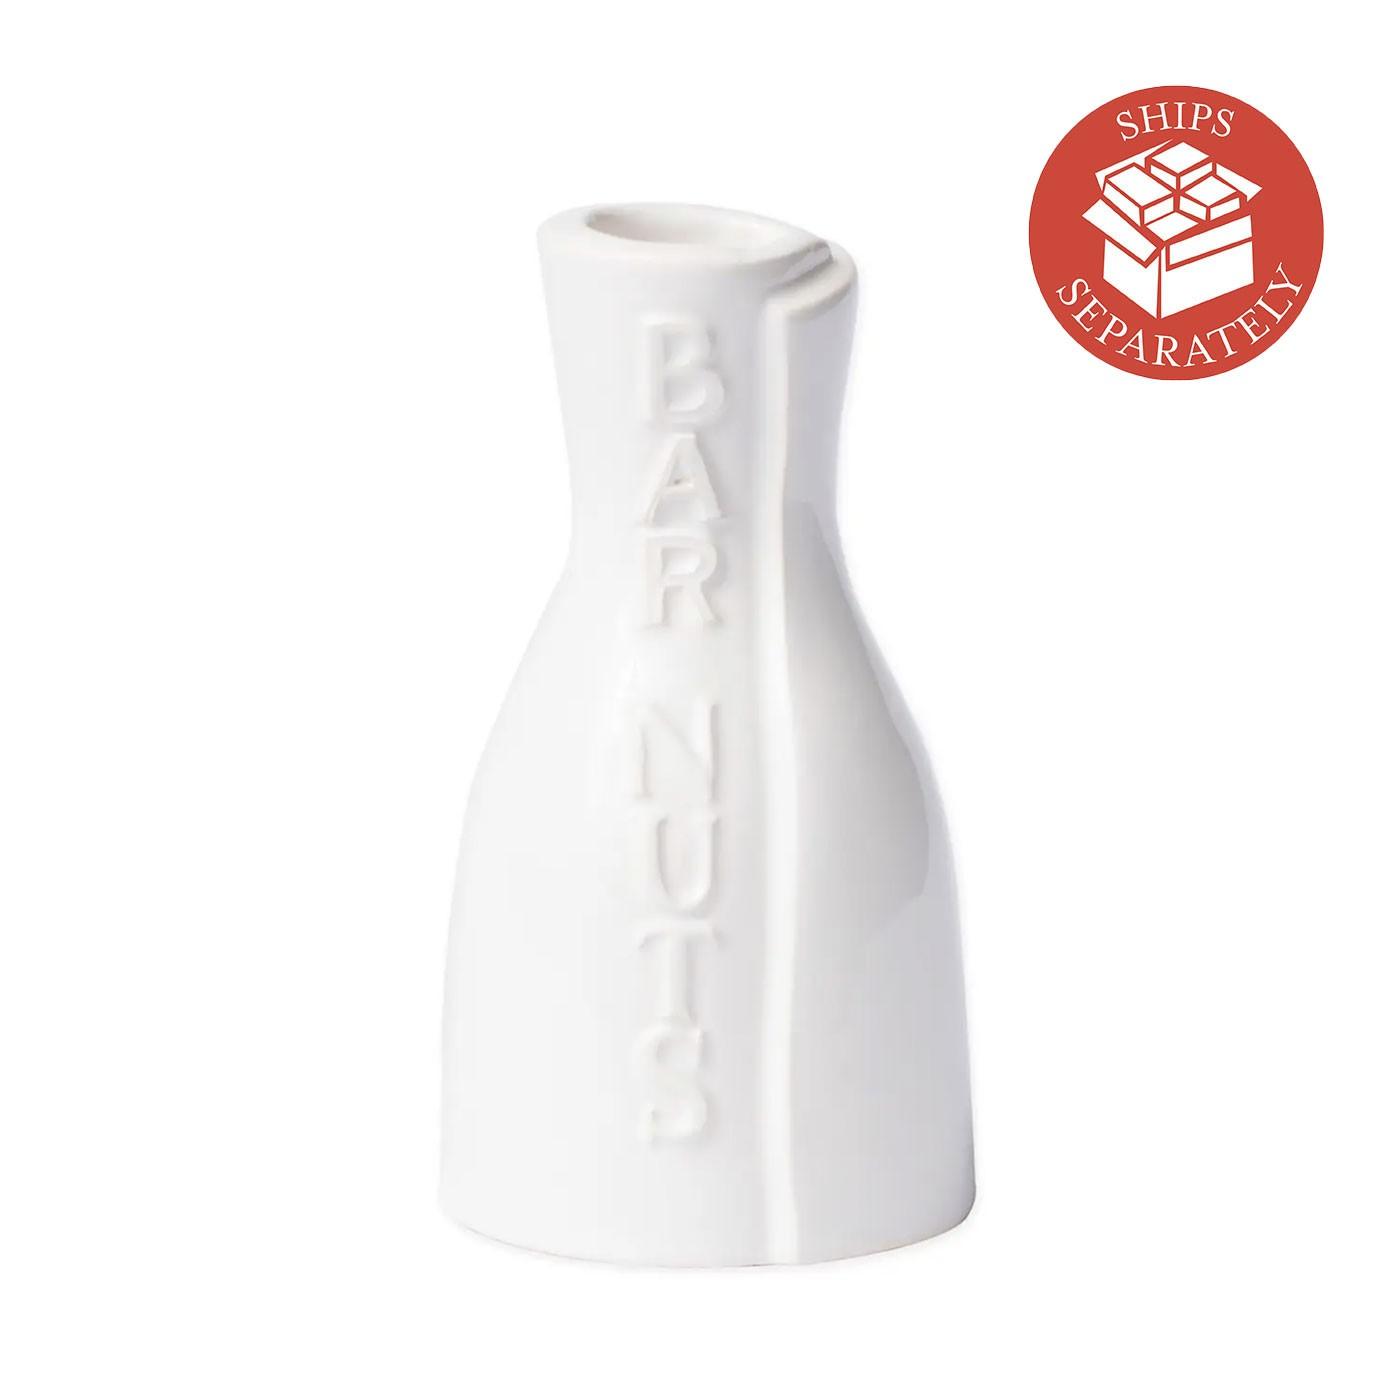 Lastra White Nuts Bottle  - Vietri | Eataly.com